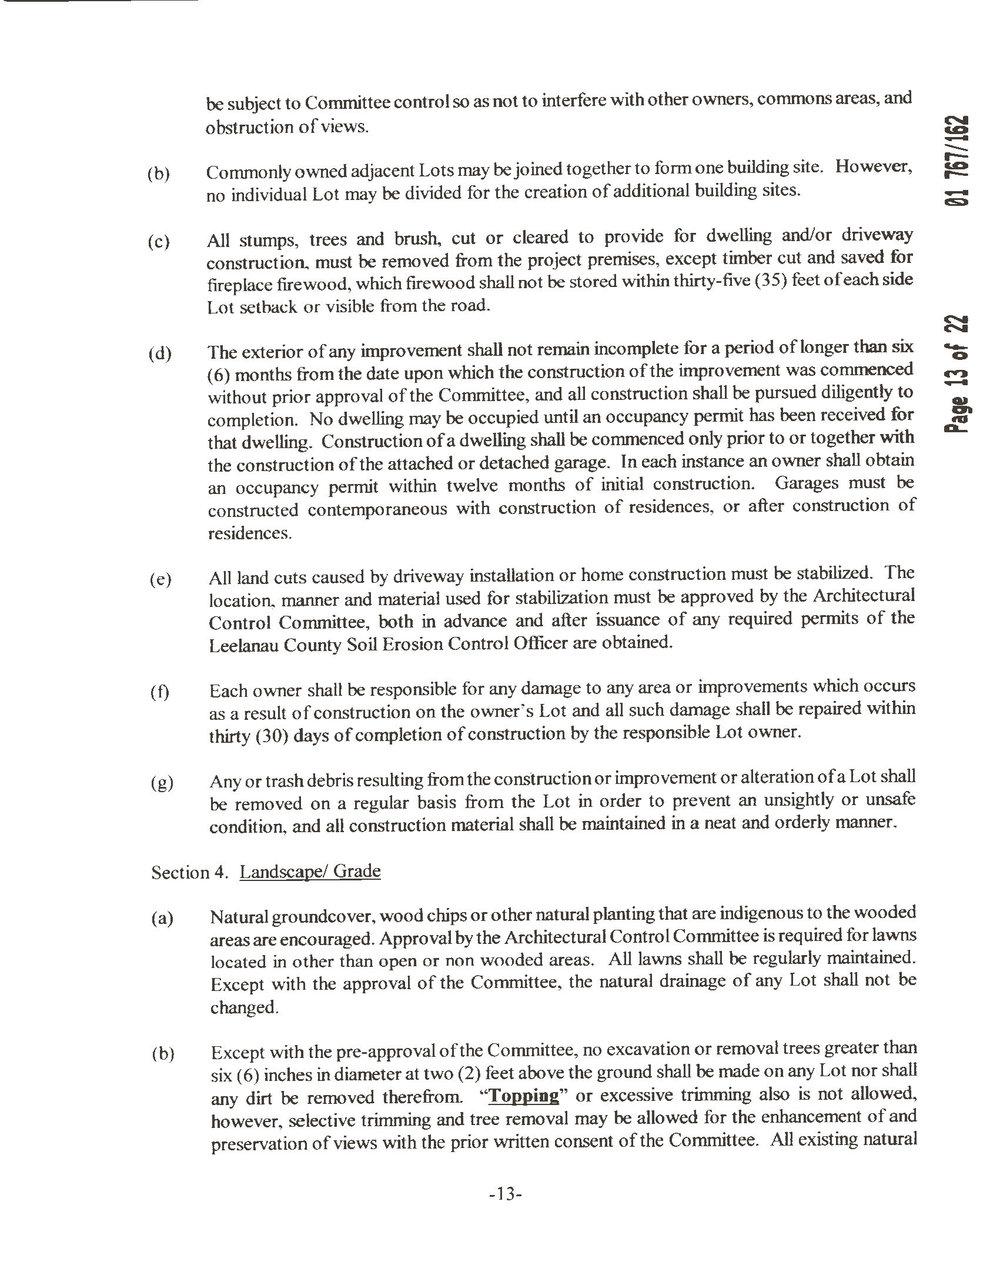 11635 E Belanger Woods Dr Marketing Packet - For Sale by Oltersdorf Realty LLC (33).jpg